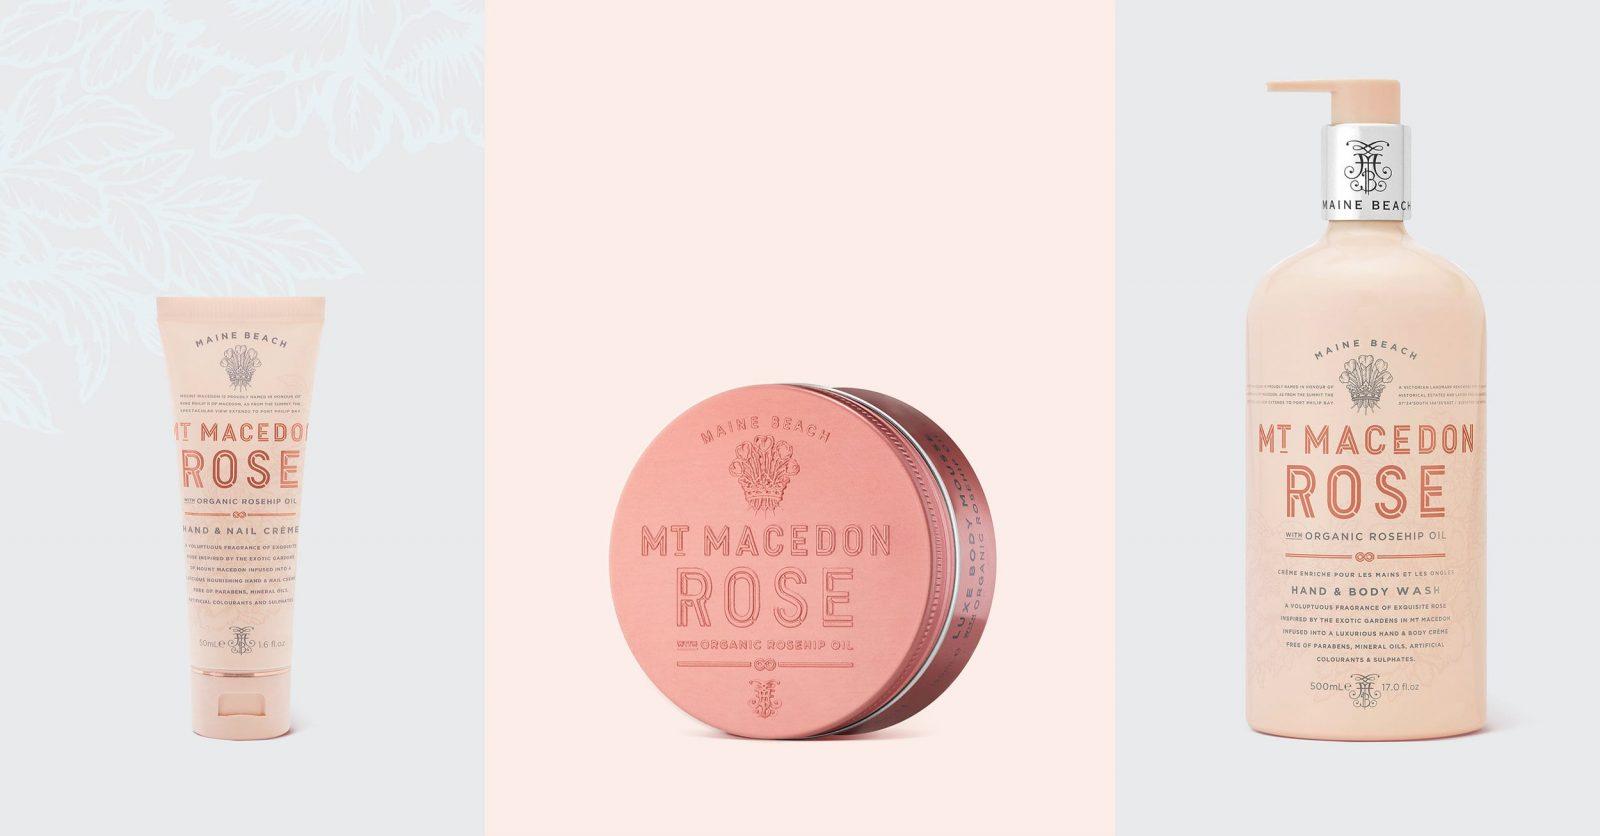 Mt Macedon Rose Bodycare